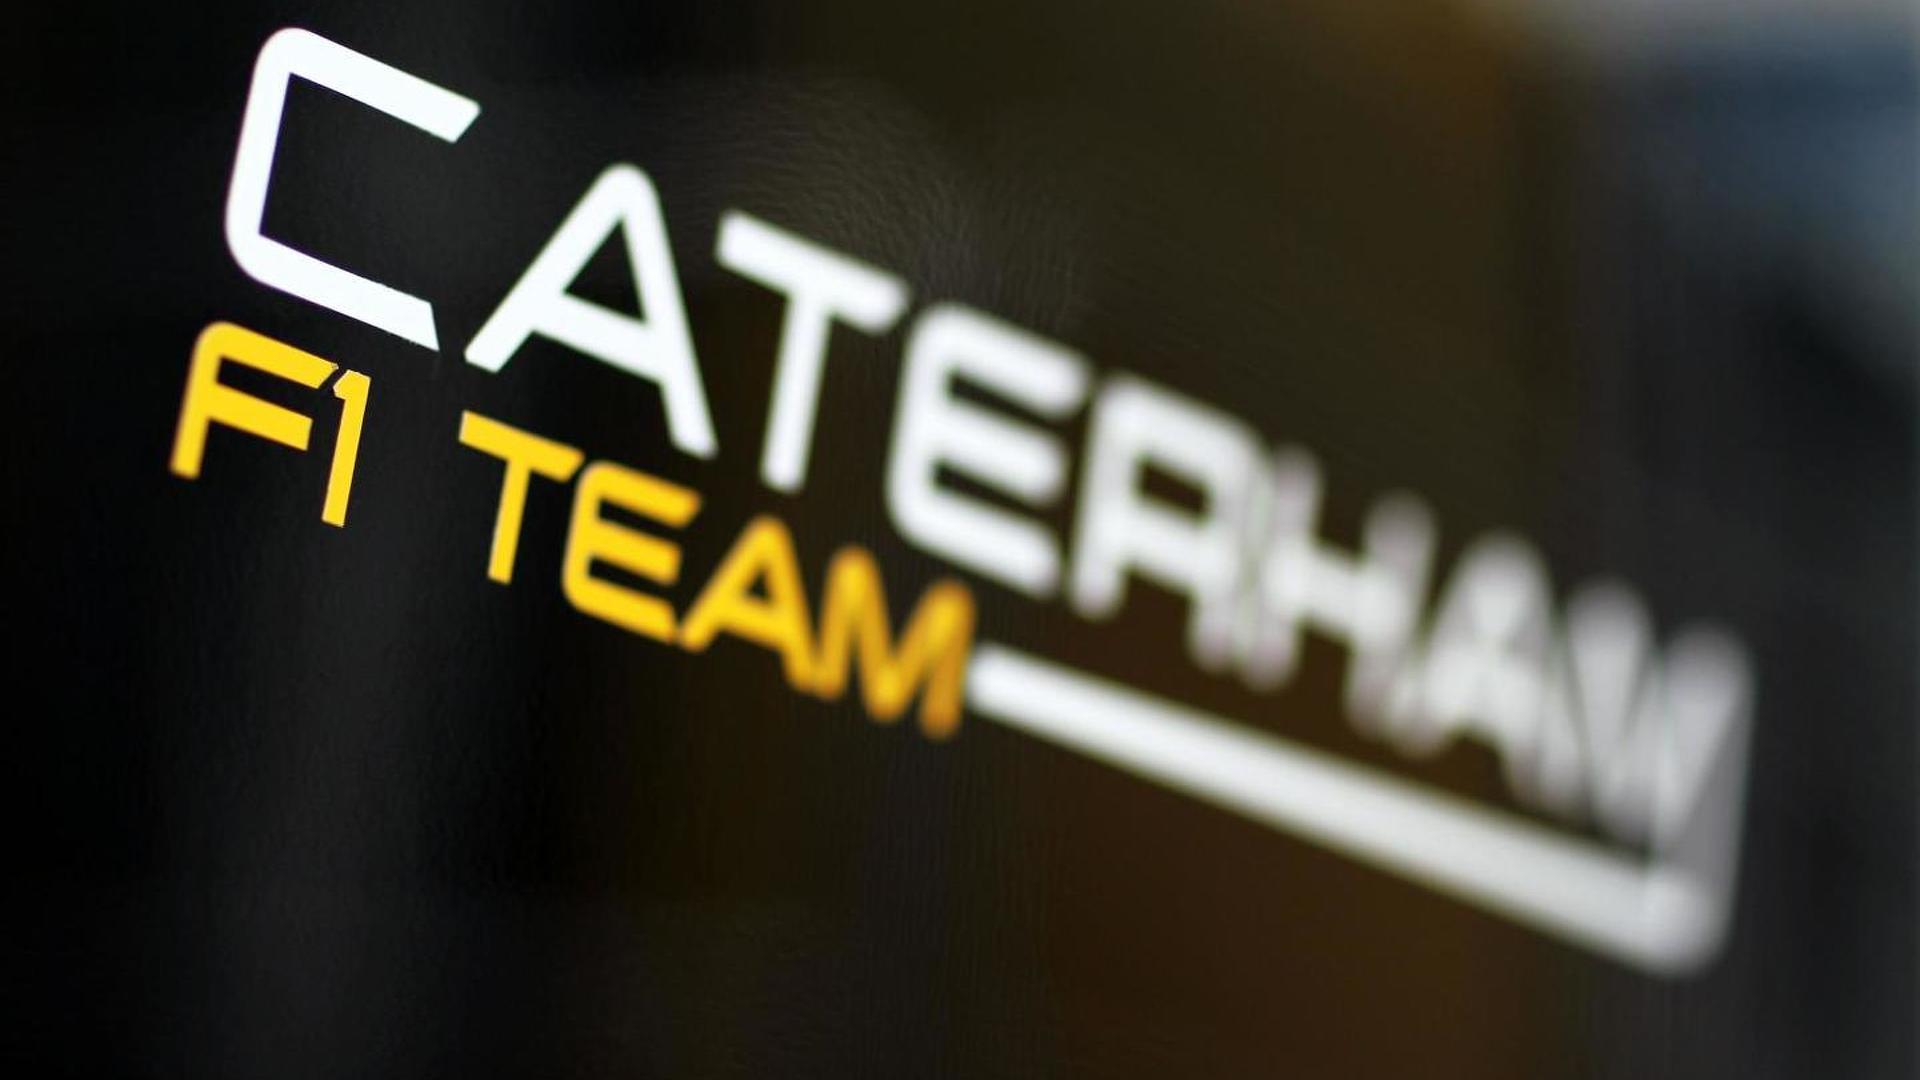 Sacked staff to sue Caterham - report